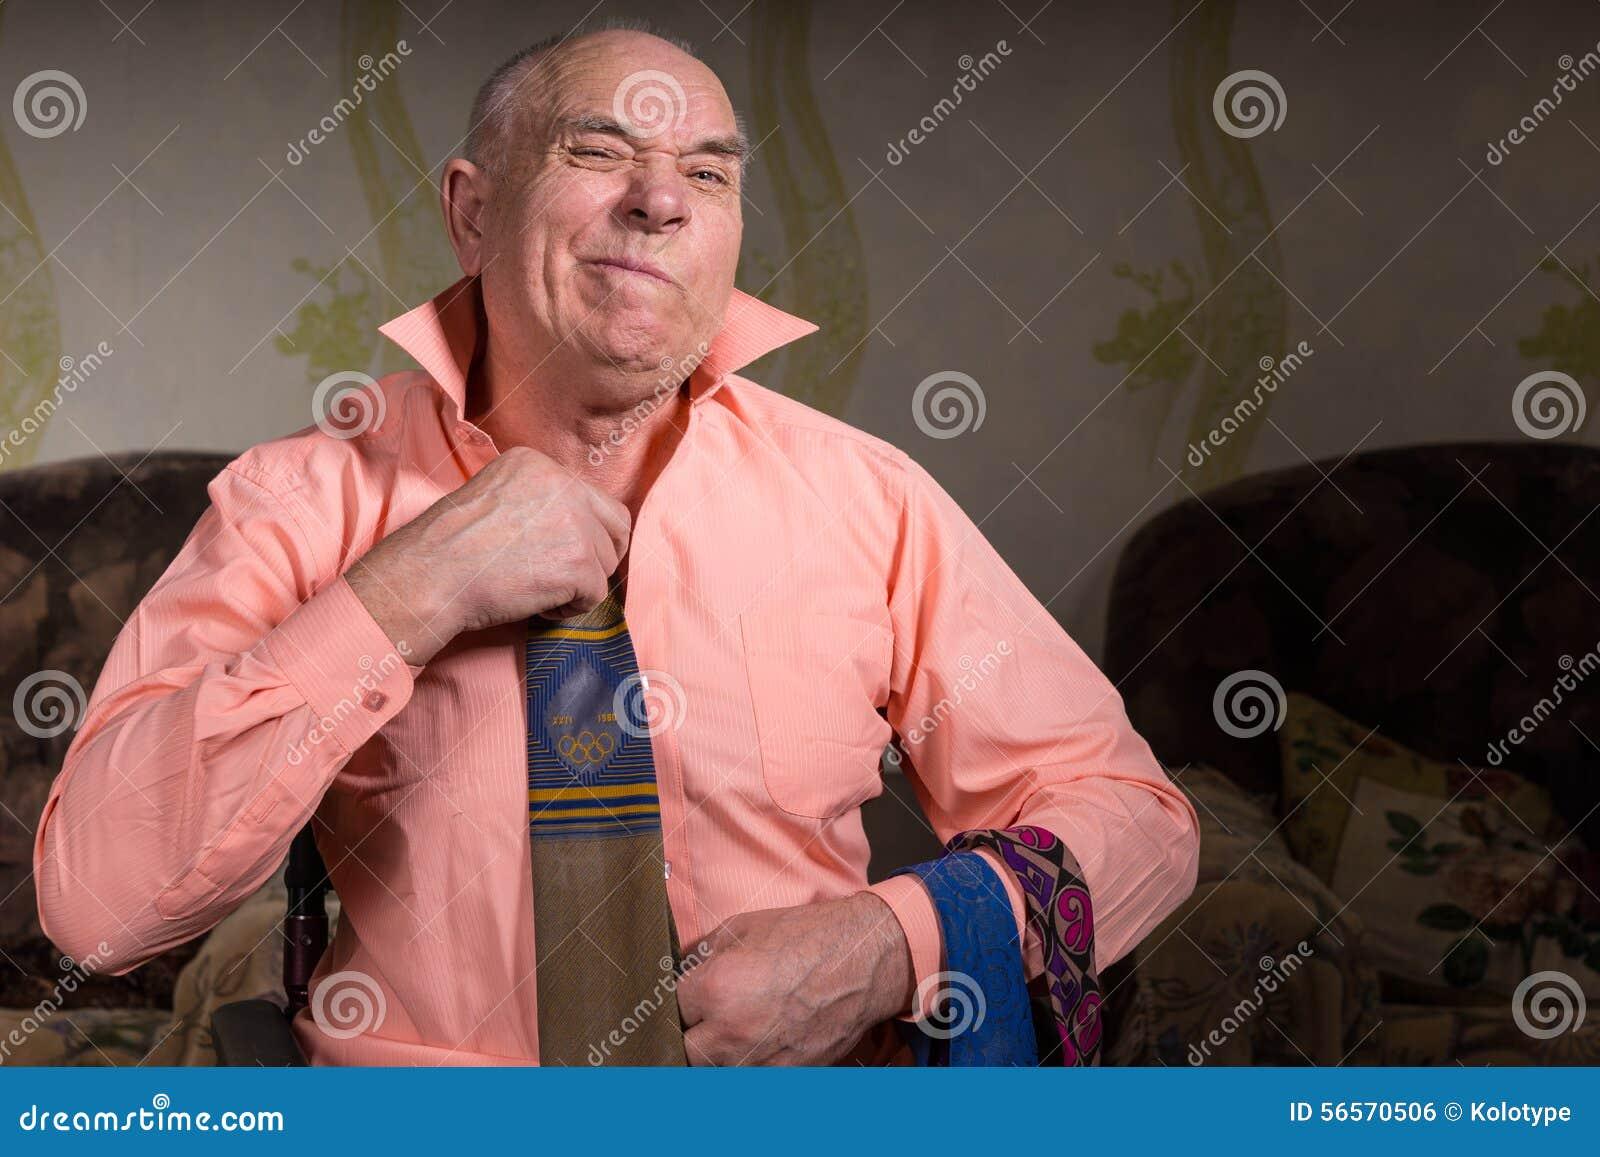 Download Ο ηληκιωμένος προσπαθεί σε έναν δεσμό με το δυσαρεστημένο πρόσωπο Στοκ Εικόνες - εικόνα από ιματισμός, διαβίωση: 56570506